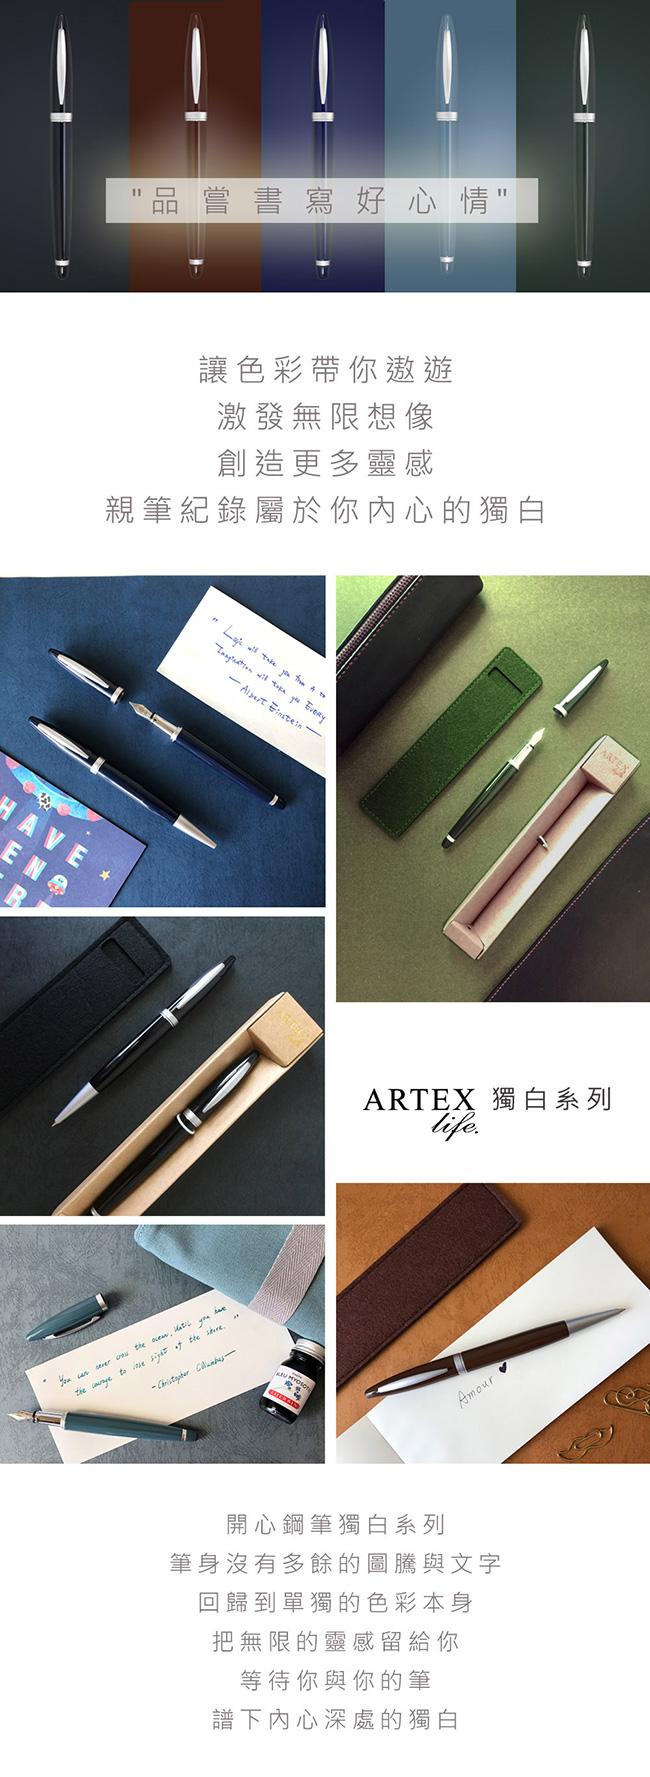 ARTEX| 開心鋼筆-海上航行